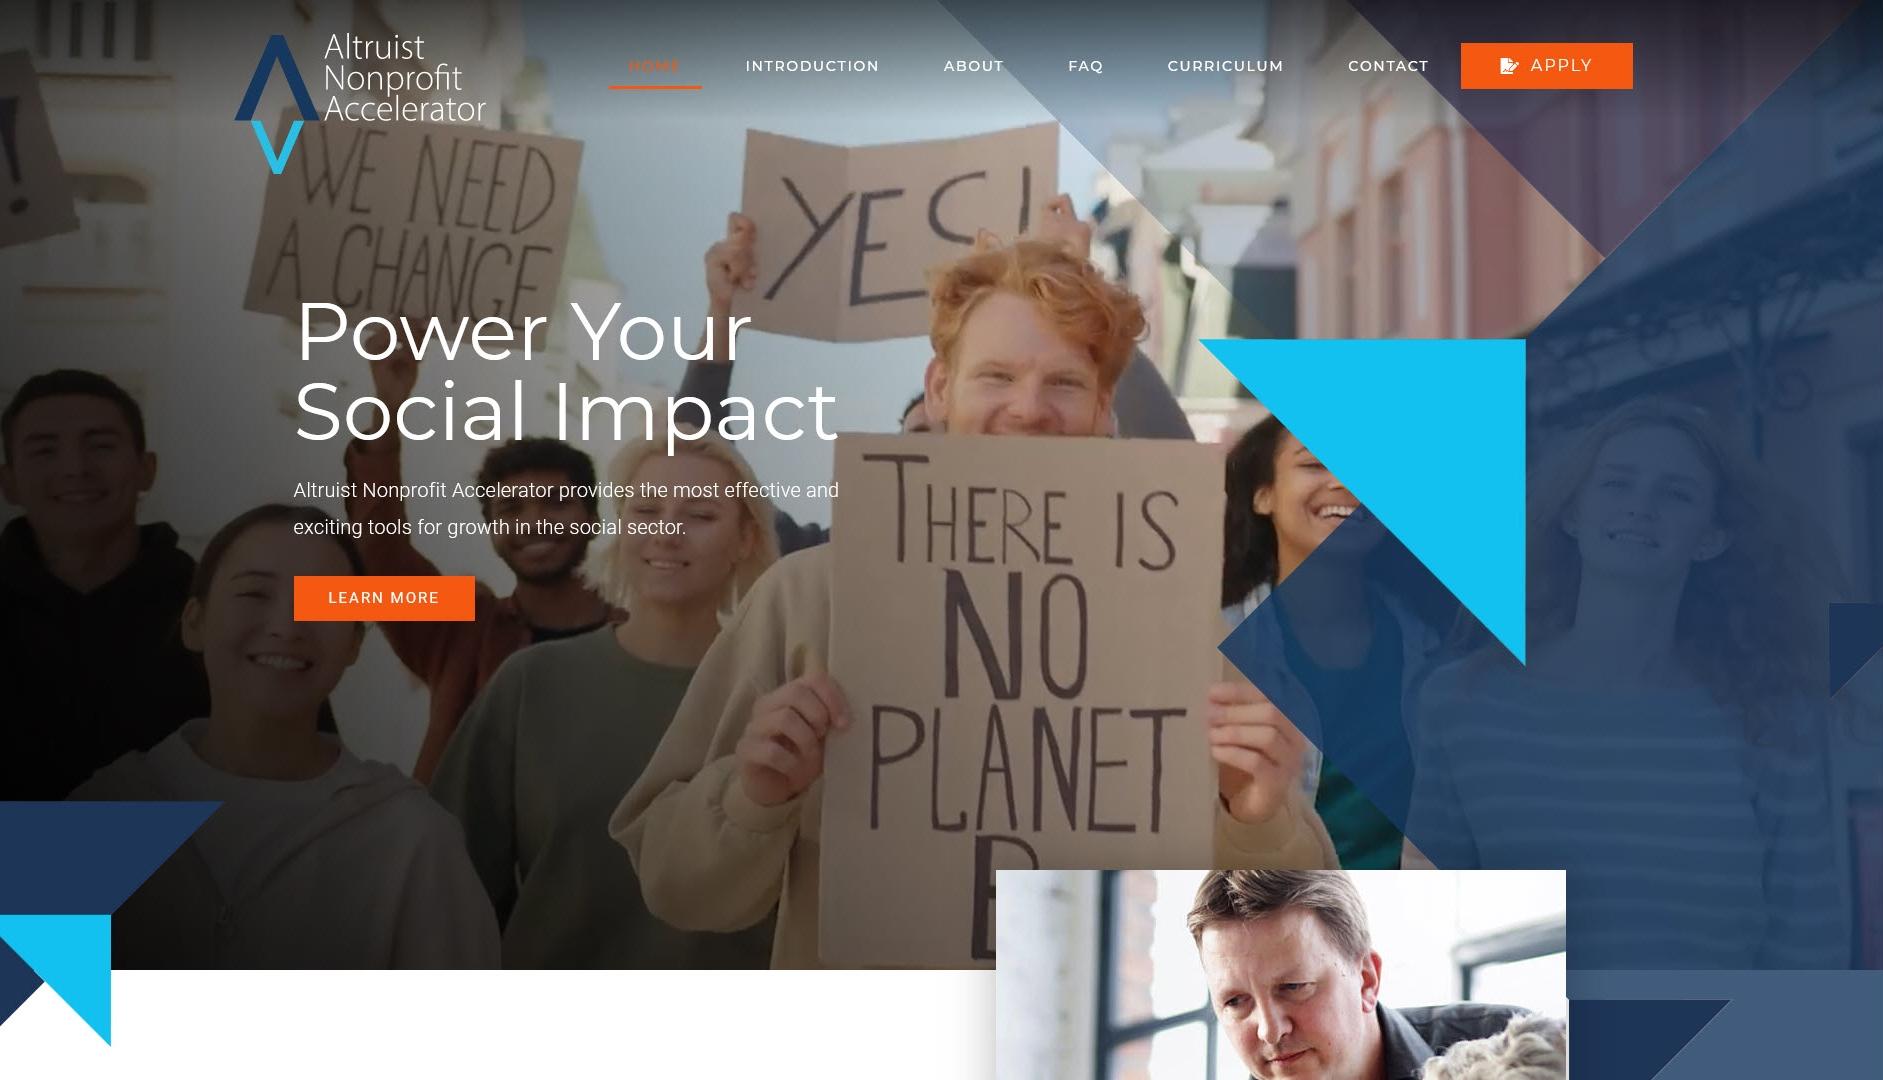 Altruist Nonprofit Accelerator